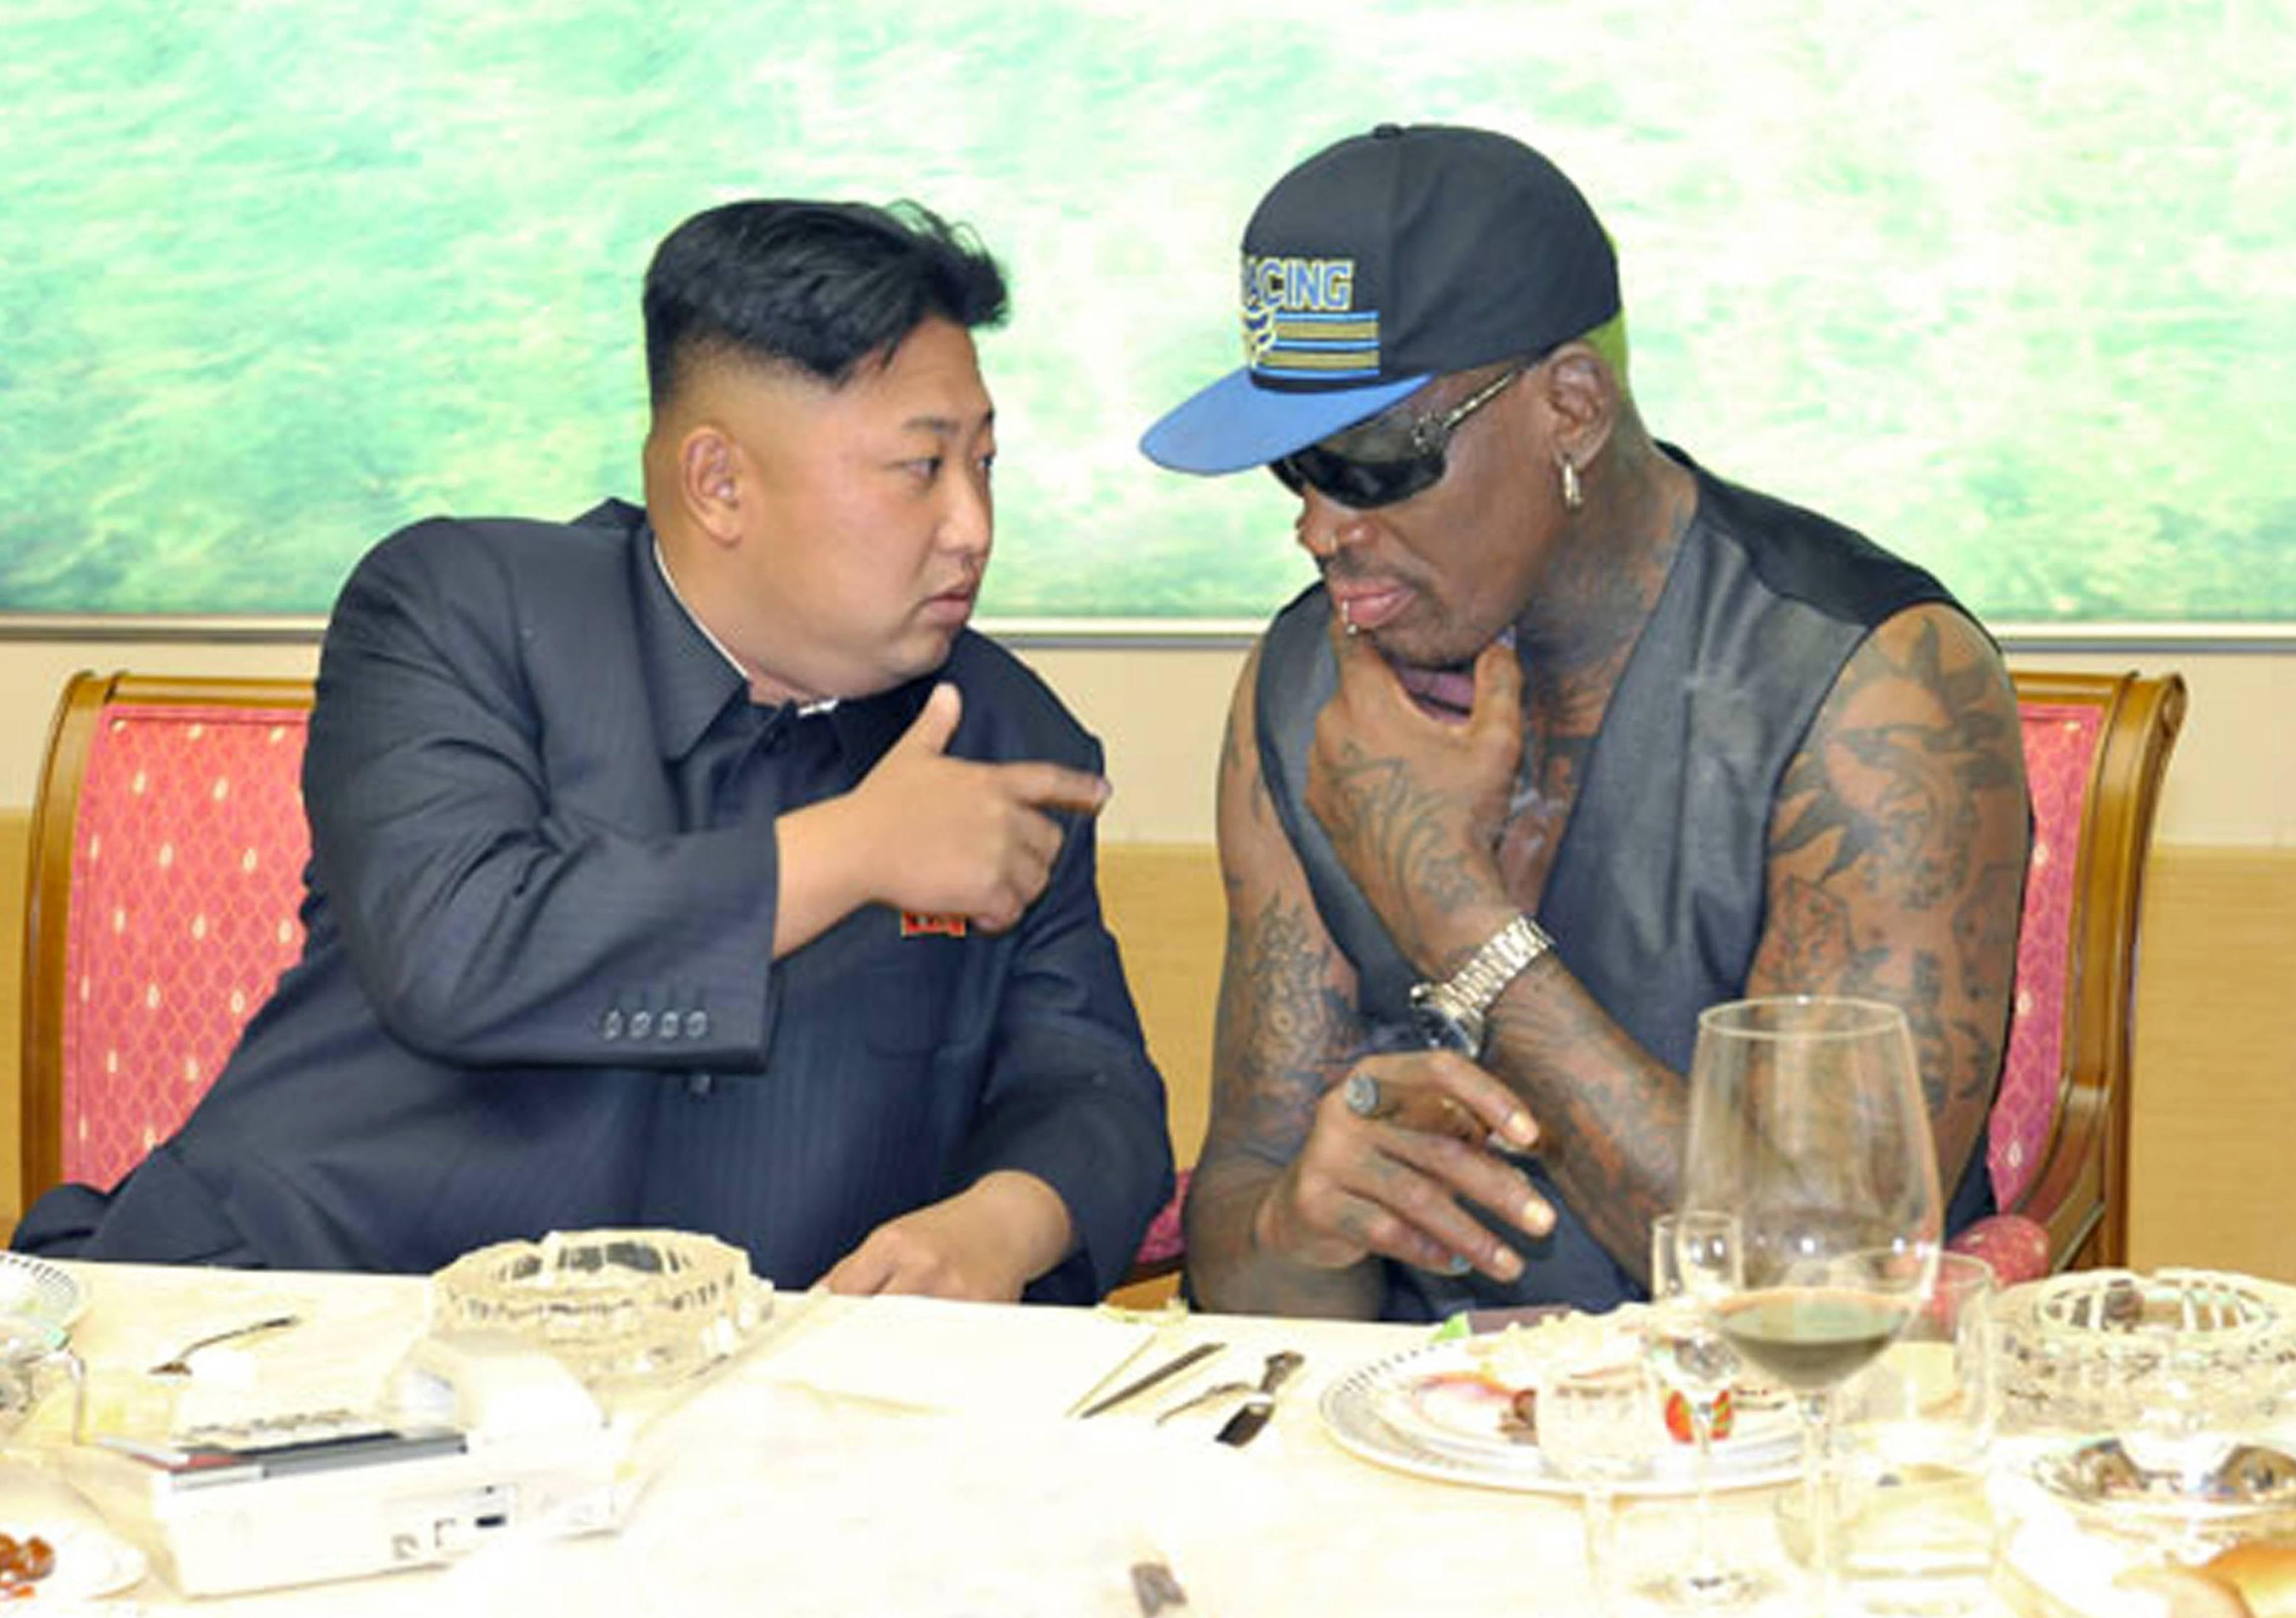 northkorearodmanpuer2-2c4dae24a075d2022818c7ec70d1e59b.jpg